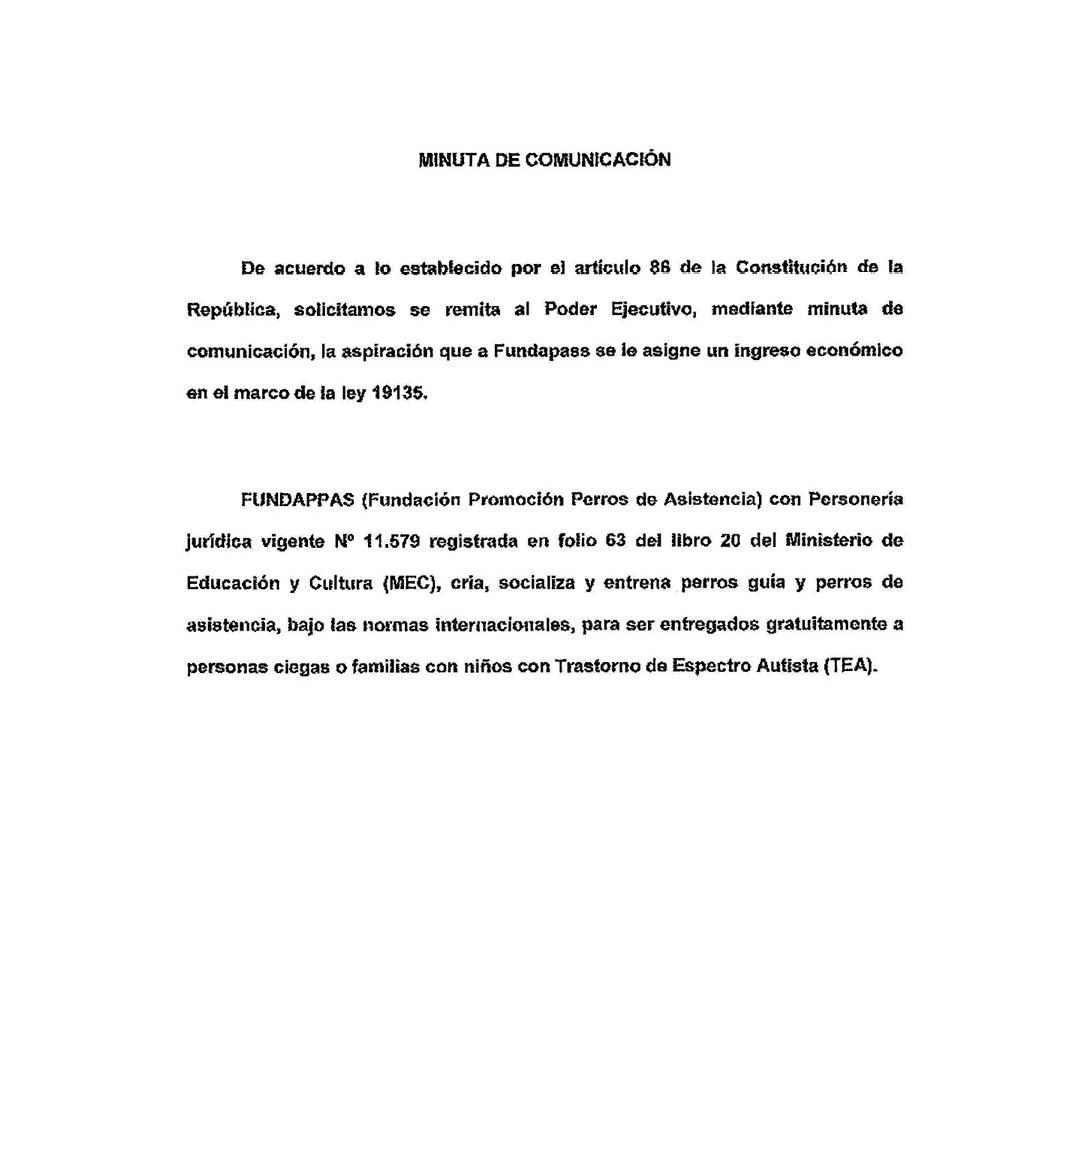 Asombroso Asistente Administrativo Reanudar Funcional Patrón ...